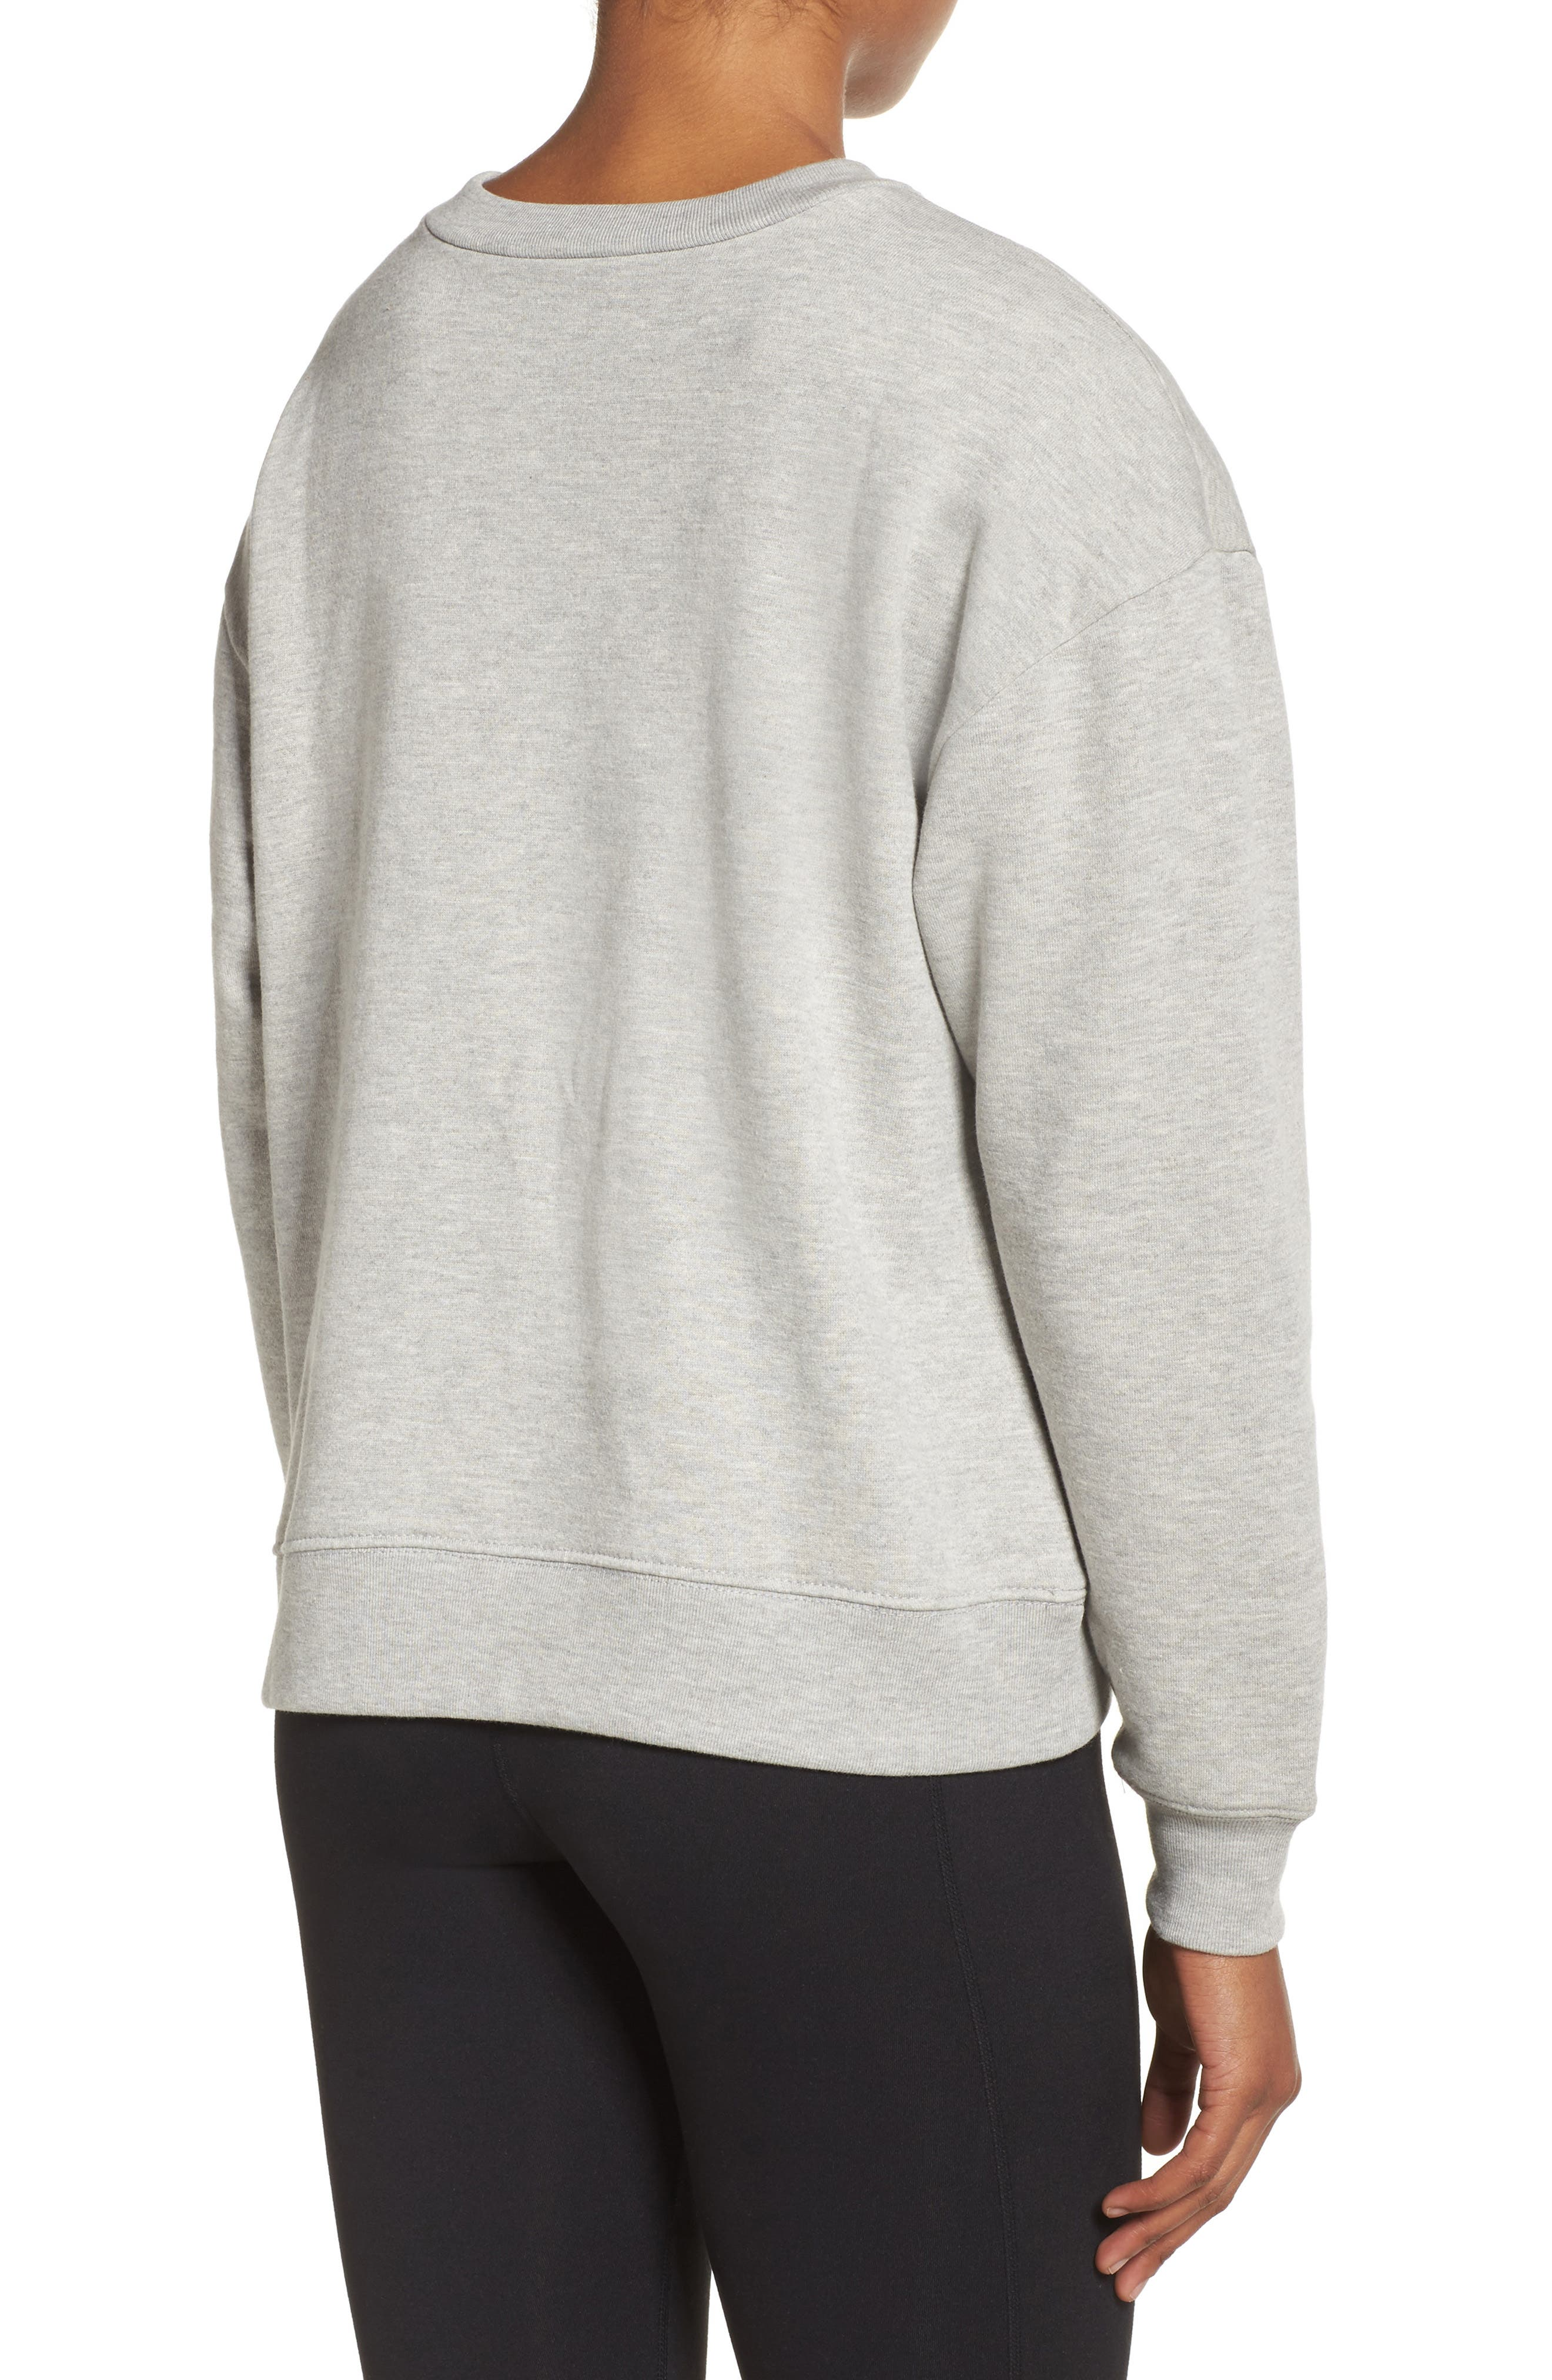 Lace-Up Crewneck Sweatshirt,                             Alternate thumbnail 2, color,                             Grey Heather